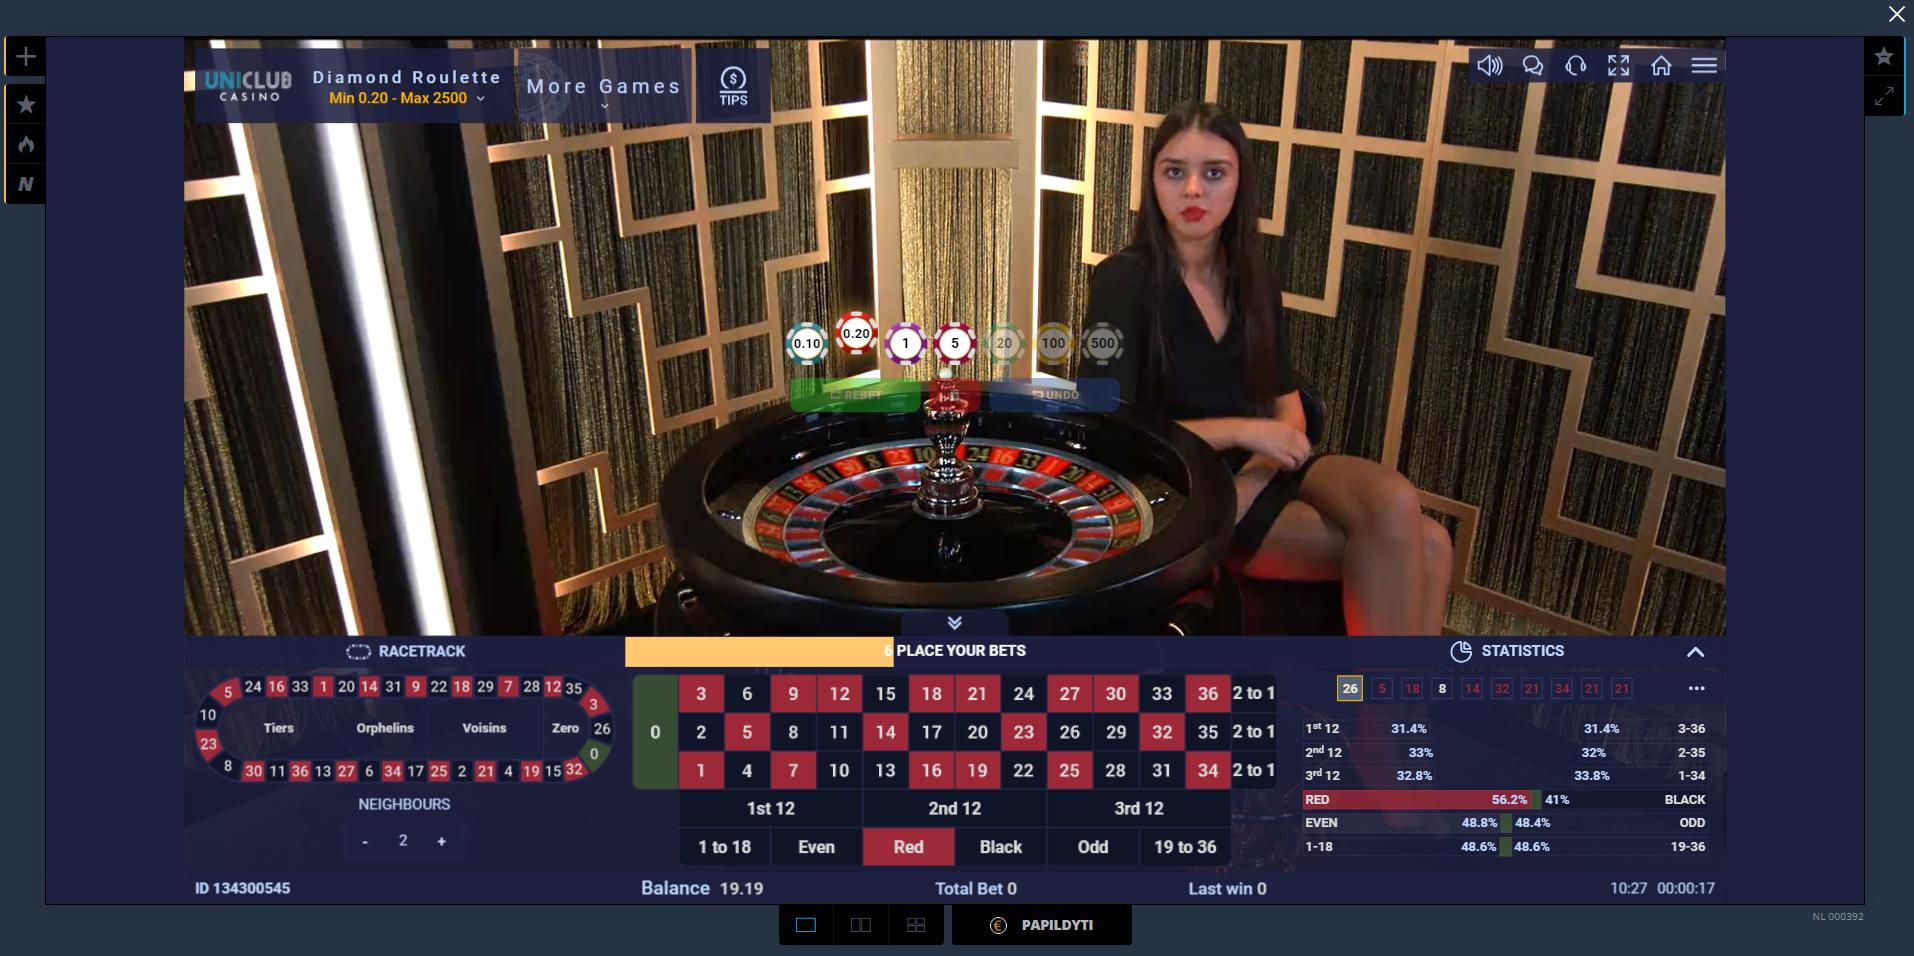 uniclubcasino ezugi live kazino krupjė ruletė dalintoja